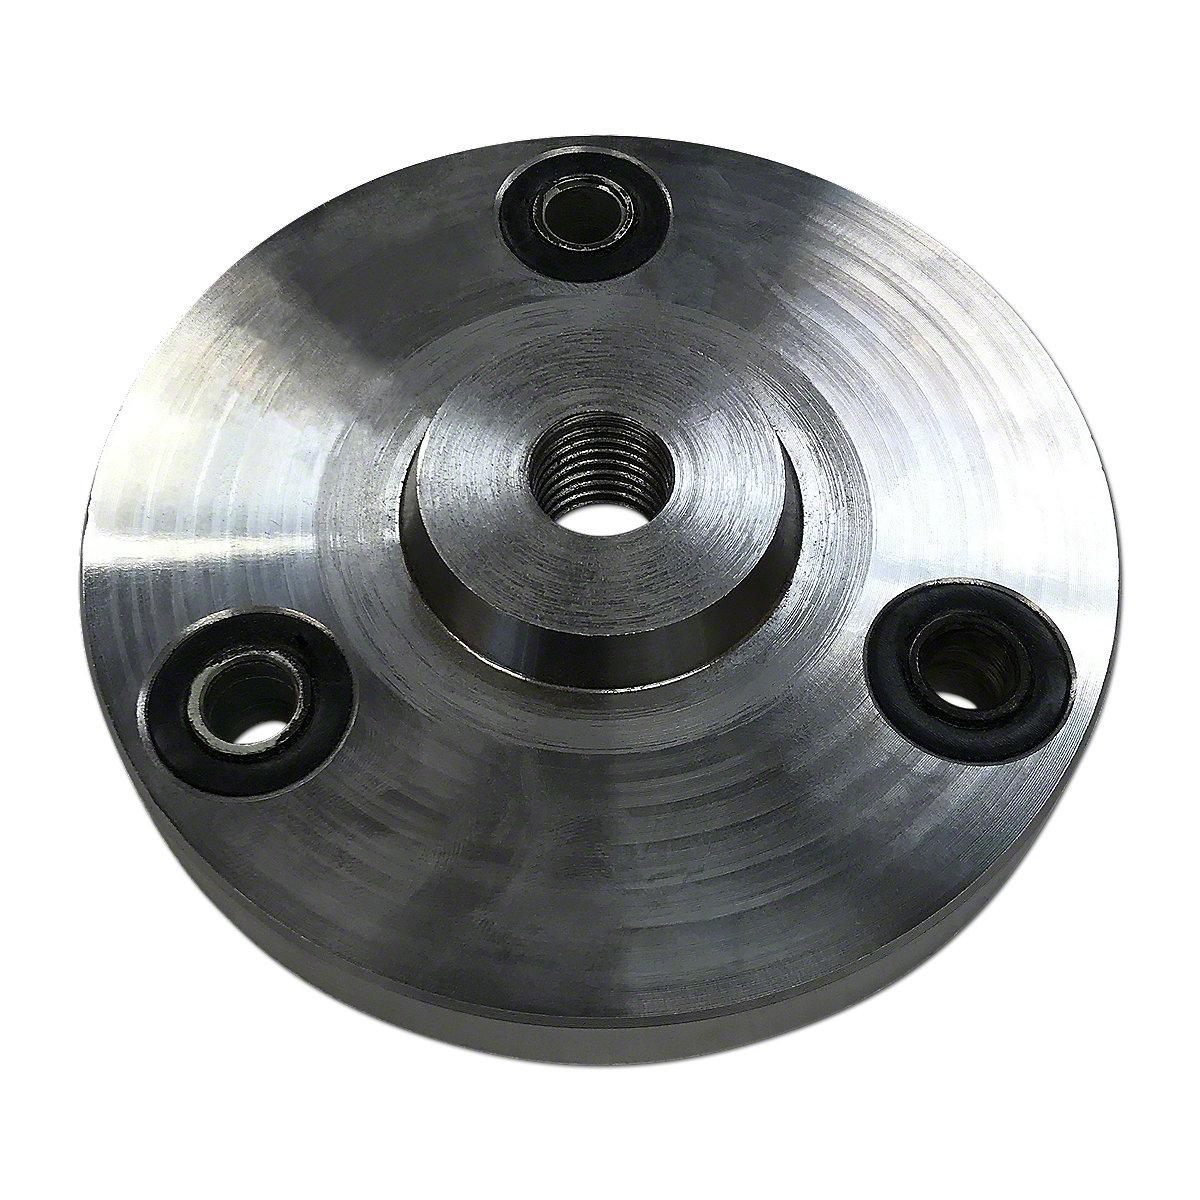 Front hydraulic pump adapter plate drive hub mfs3746 for Hydraulic pump motor adapter